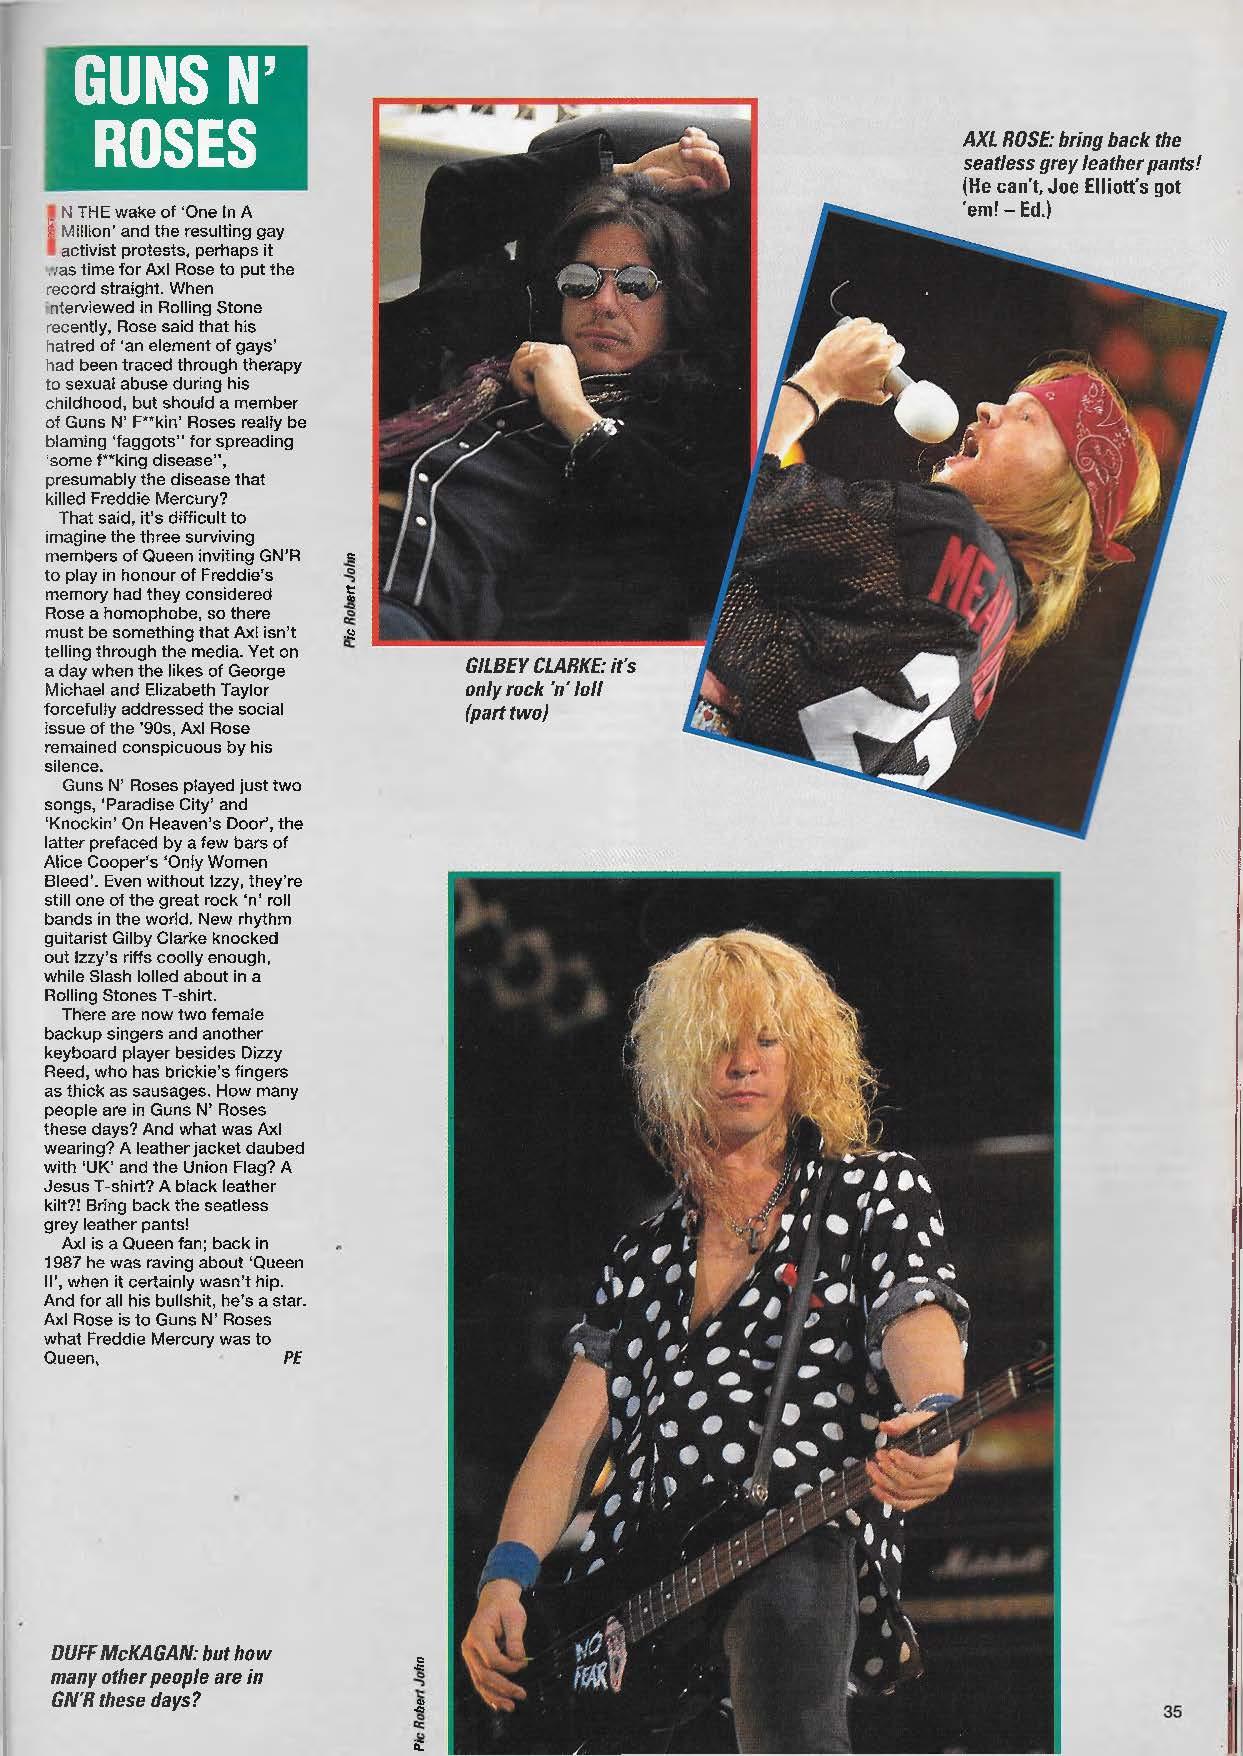 1992.04.20 - Freddie Mercury Tribute, Wembley Stadium, London, England PetmxK9Z_o